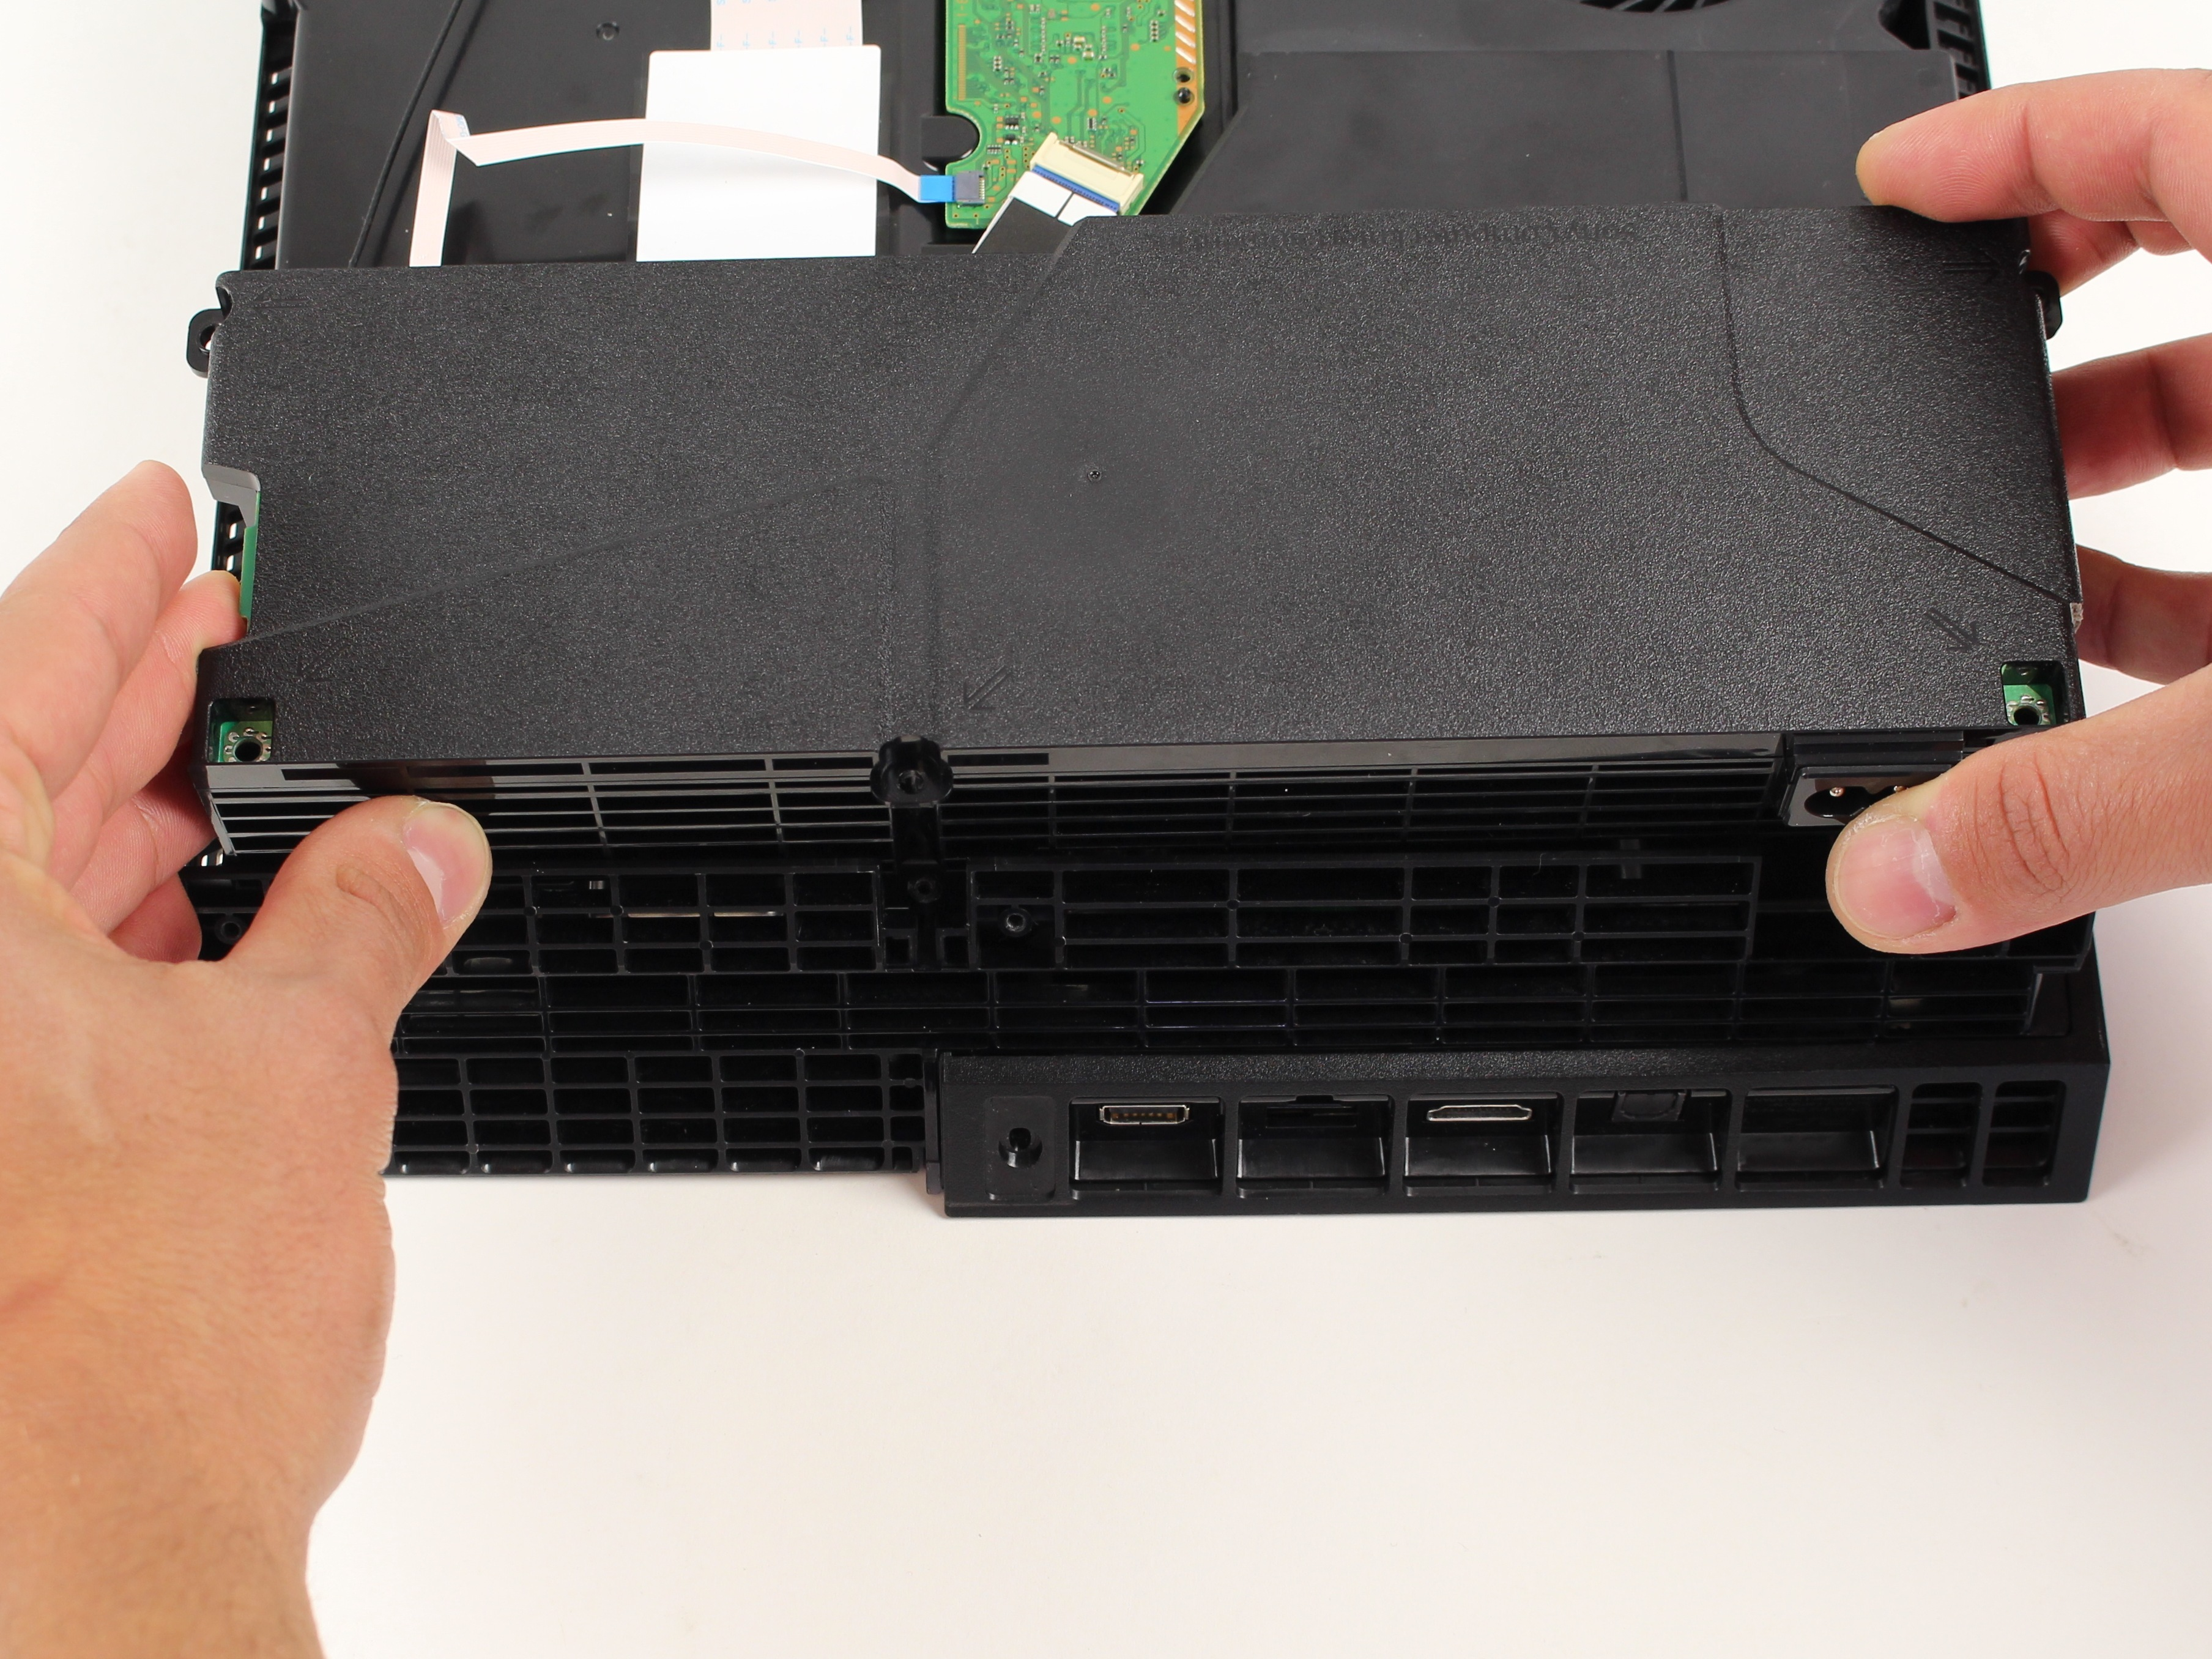 Sony Playstation 4 Repair Ifixit Slim 500gb Cuh 2006a Power Supply